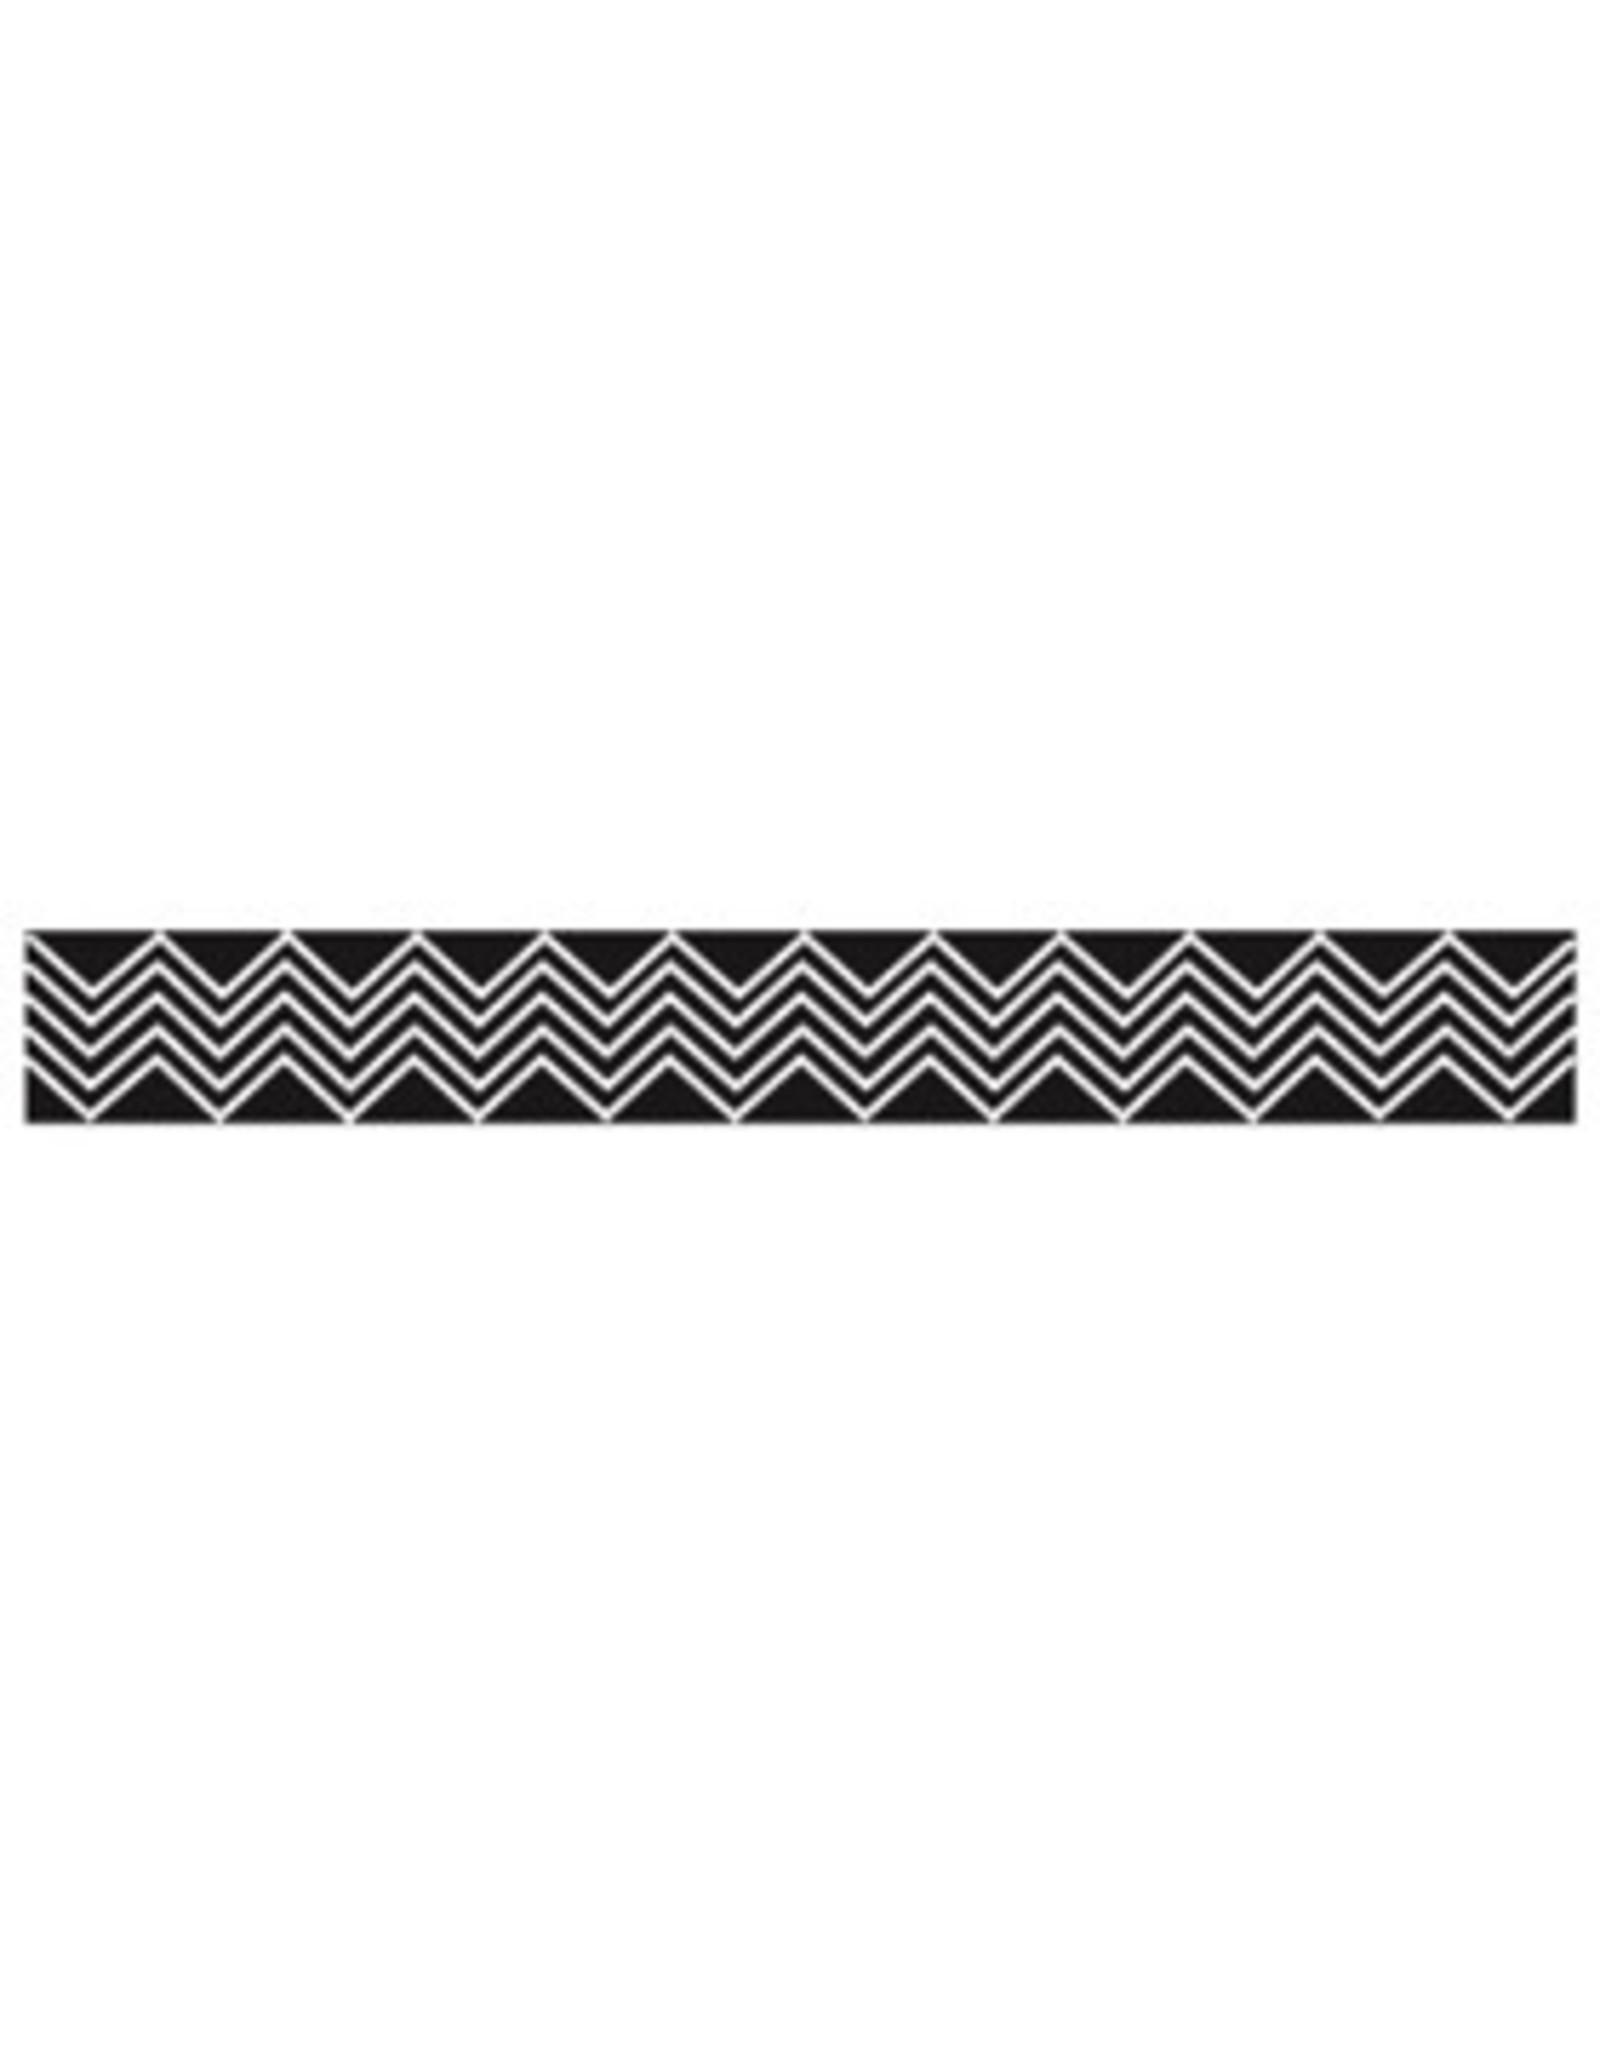 MKM tools Zigzag pattern roller